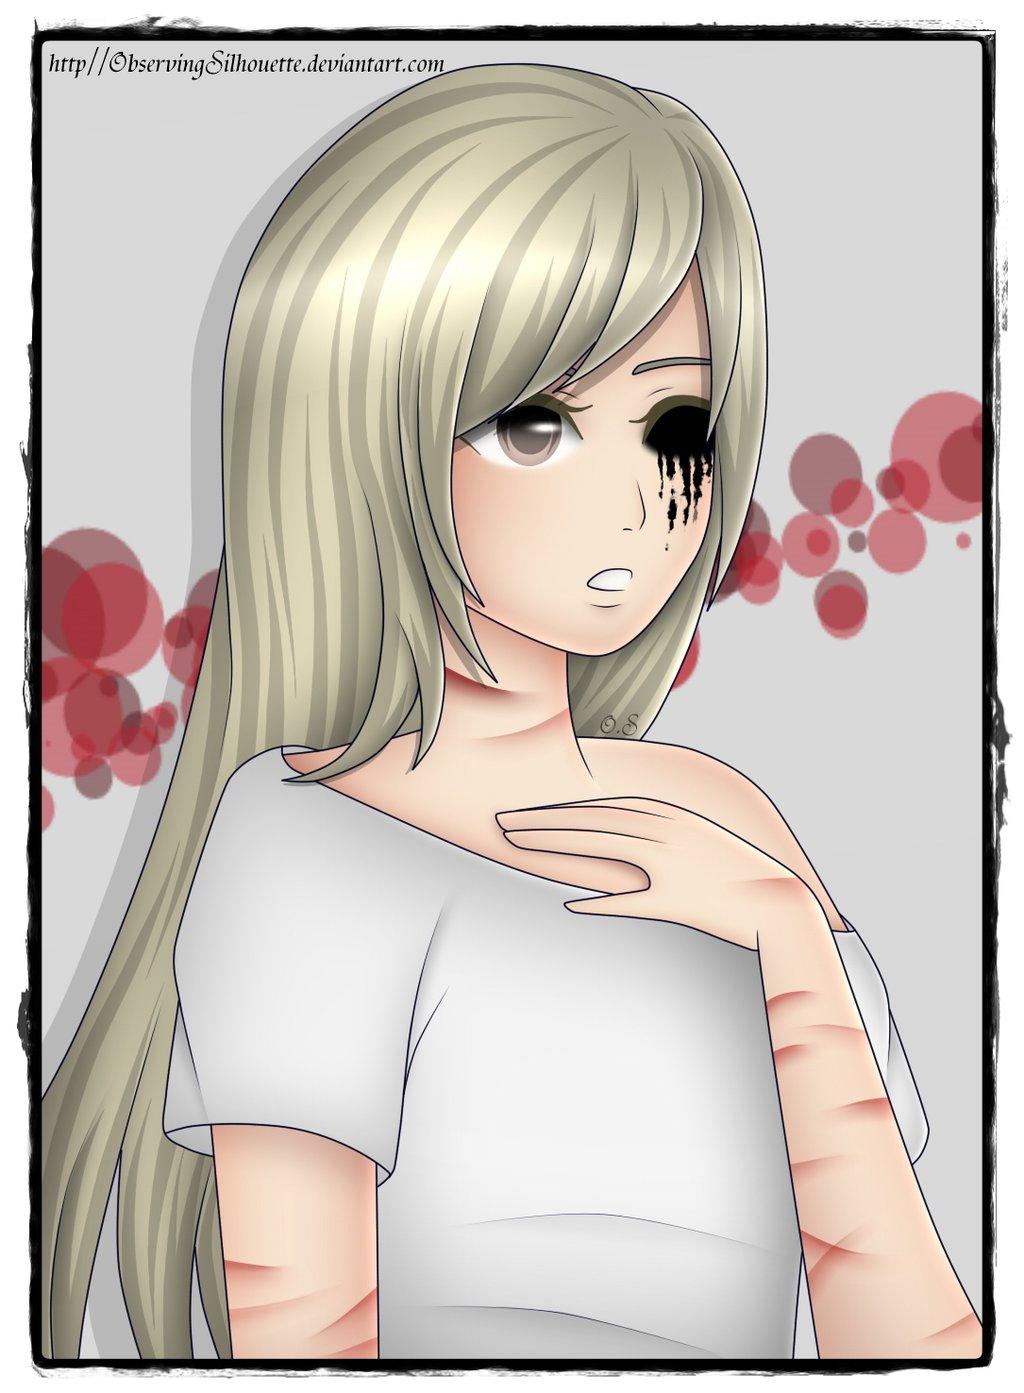 Suicide Sadie  Creepypasta Files Wikia  Fandom Powered By Wikia-7082